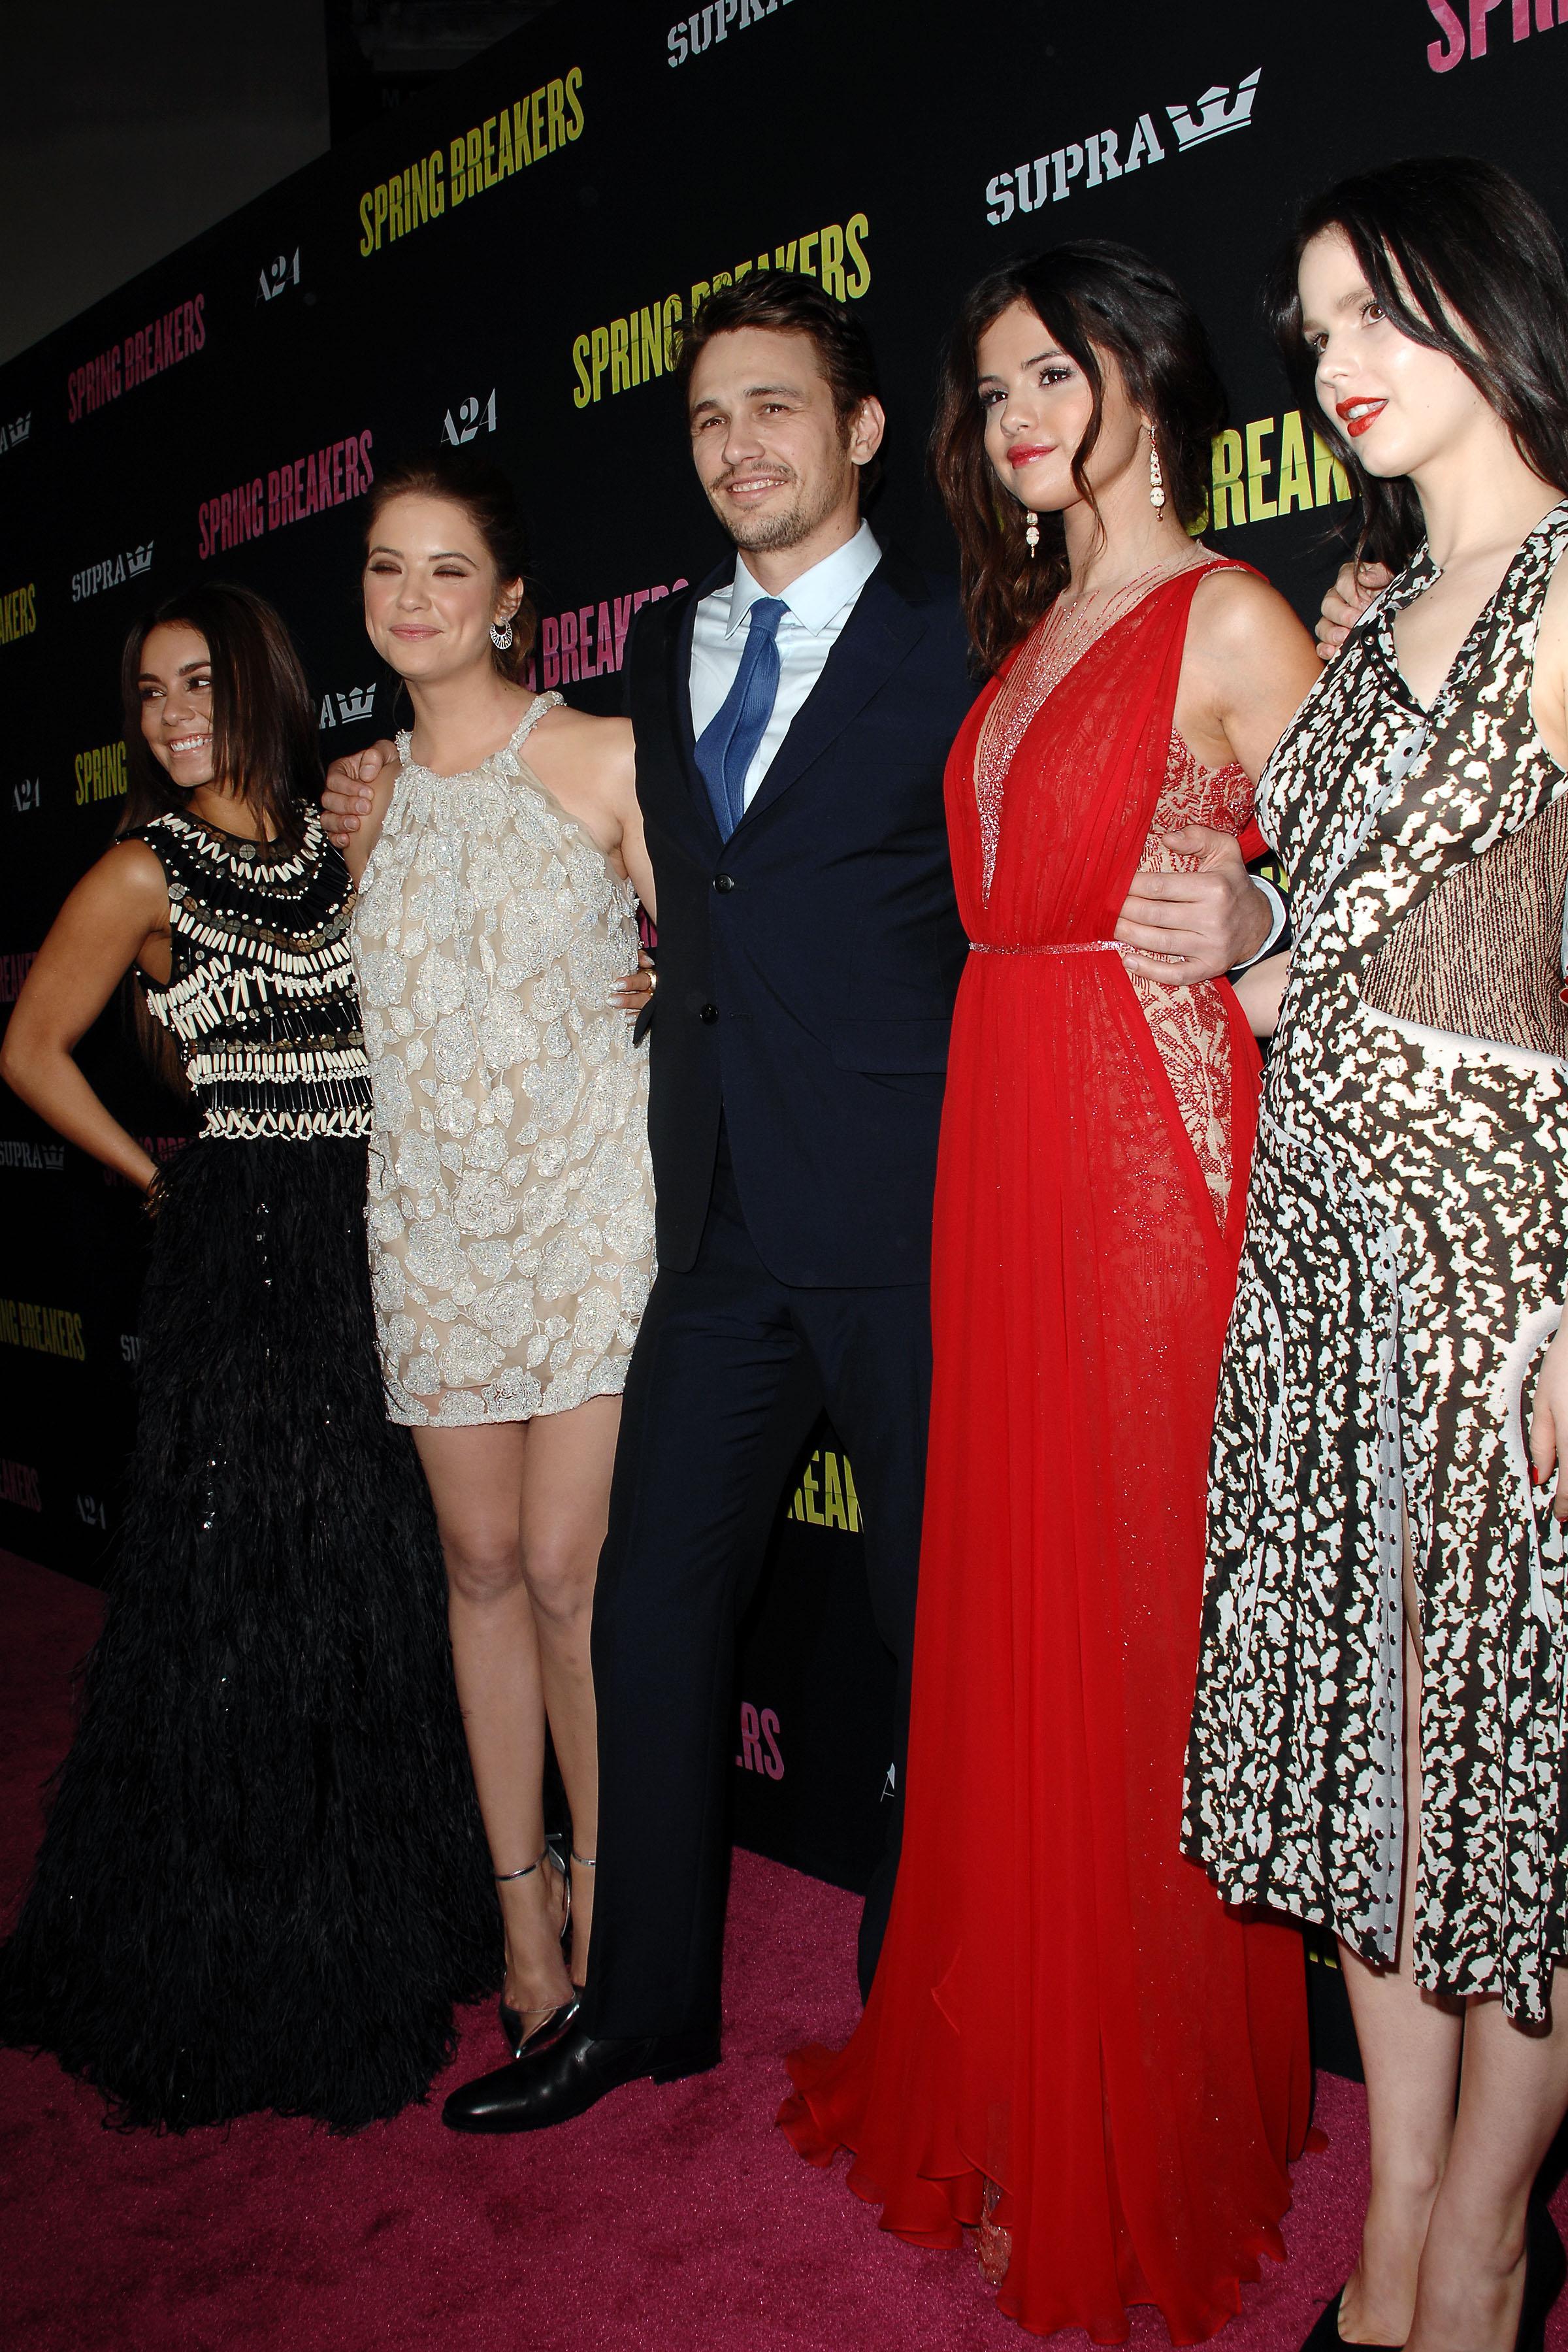 Vanessa Hudgens, Ashley Benson, James Franco, Selena Gomez, Rachel Korine - Supra Presents the SPRING BREAKERS LA Premiere and After Party